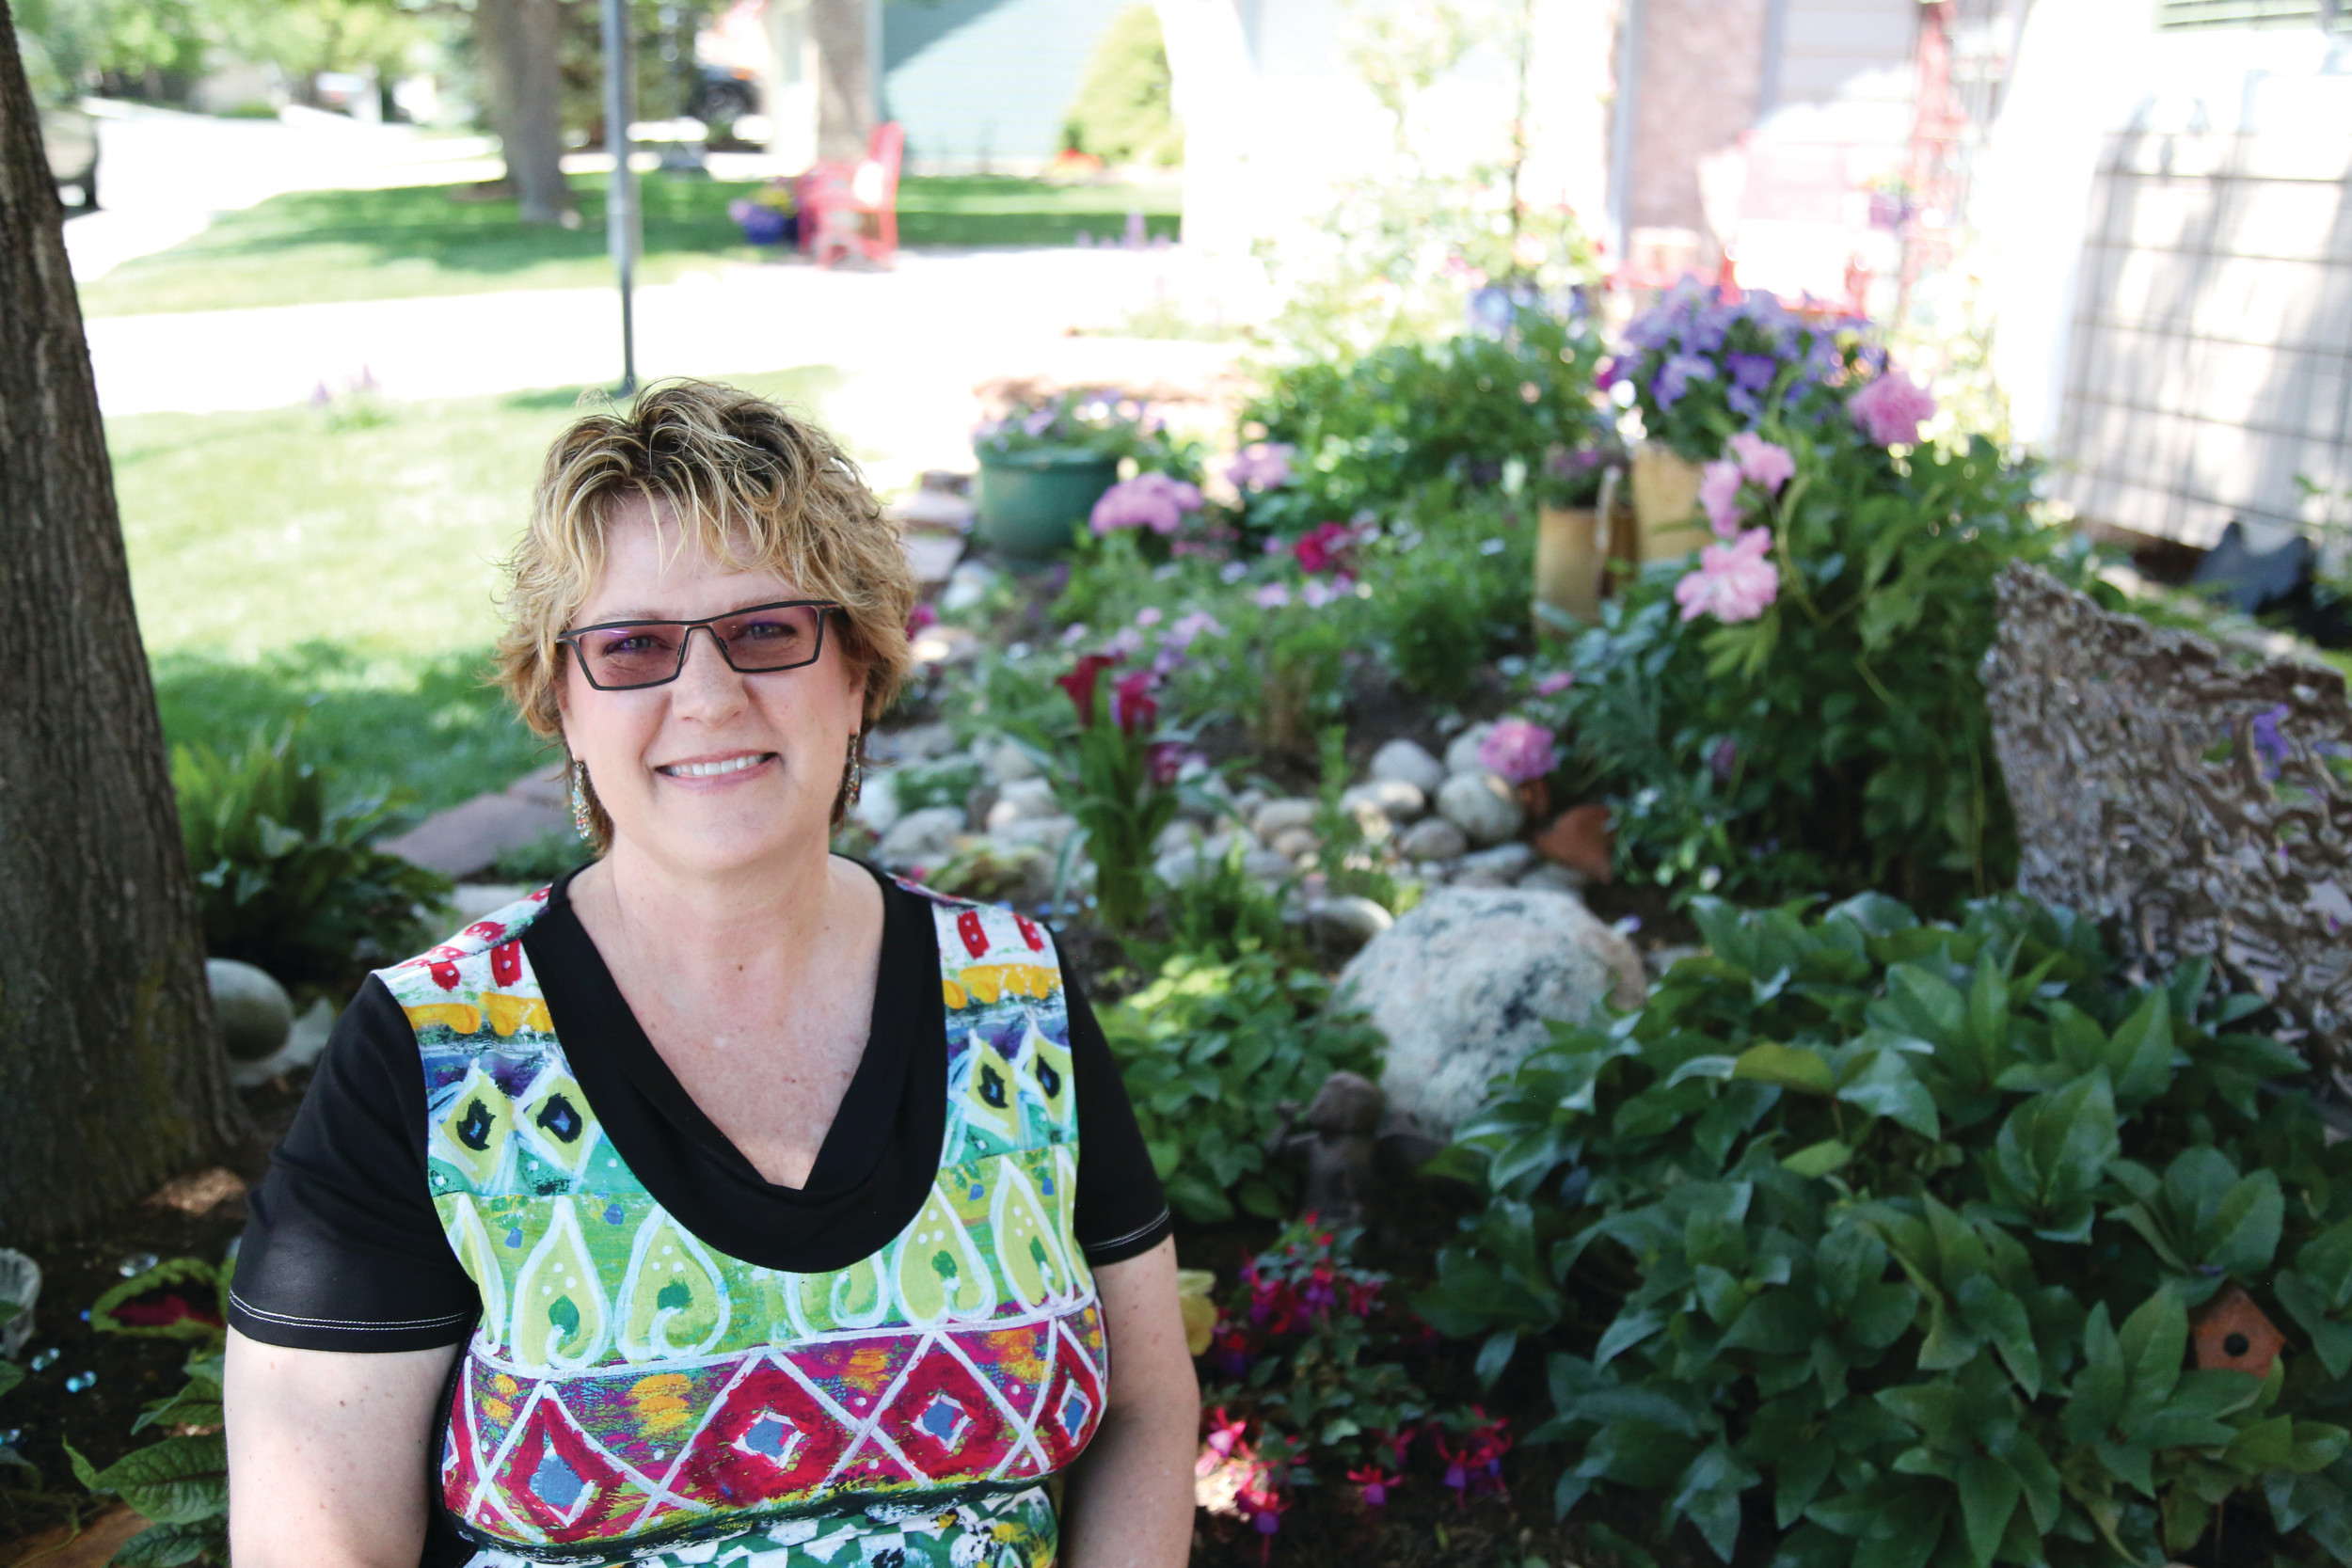 Cancer Survivor Shows Off Victory Garden